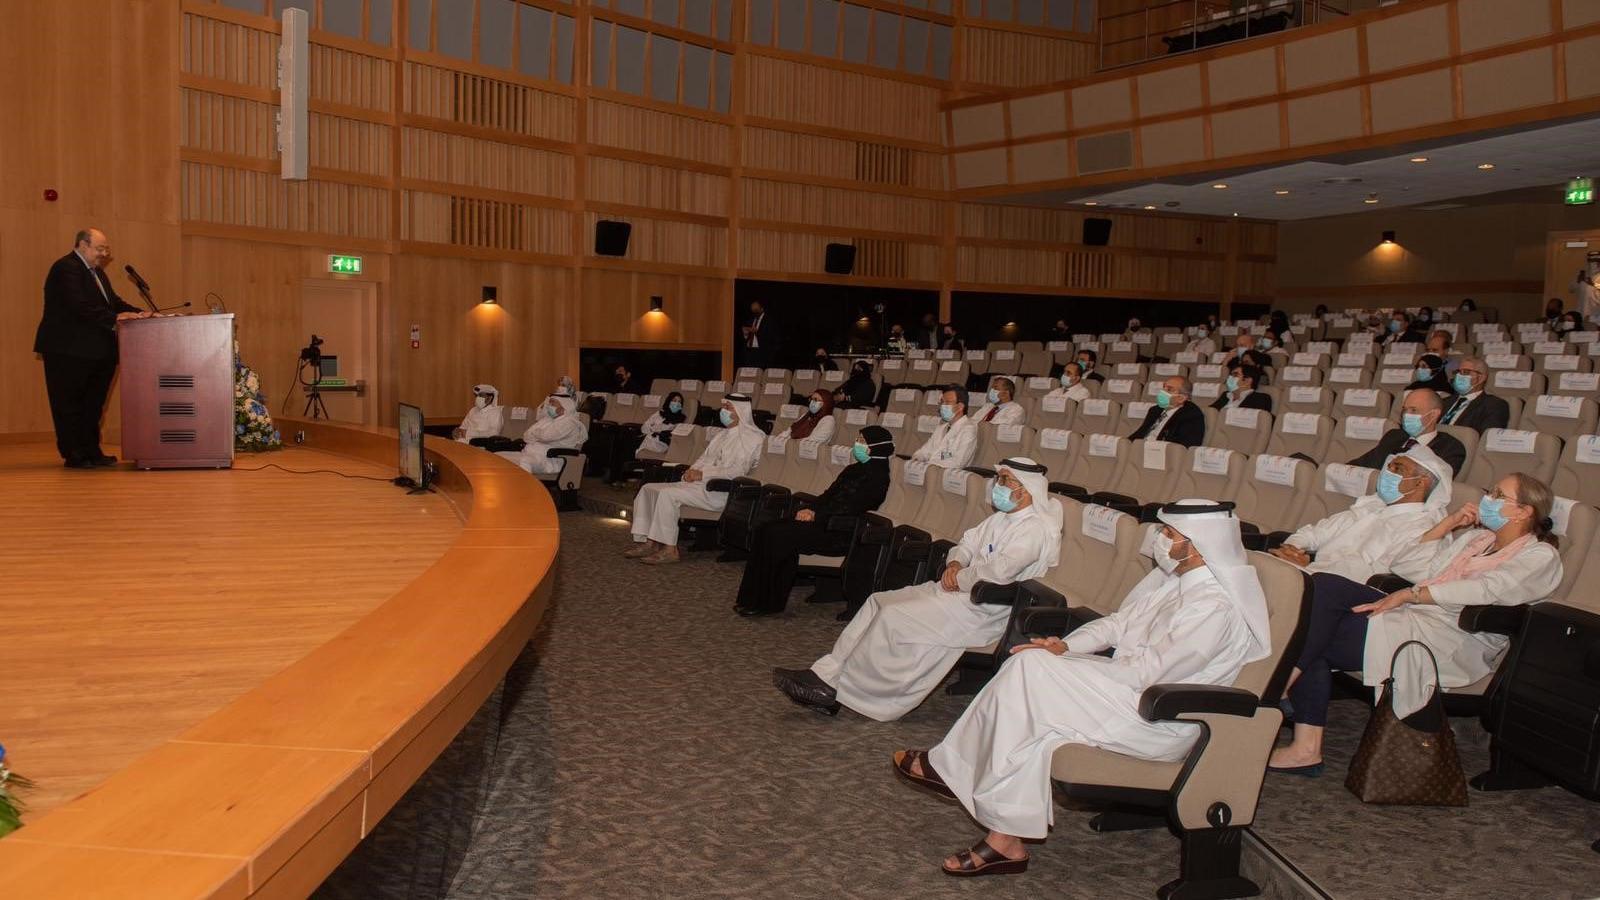 HMC launches lung transplantation program